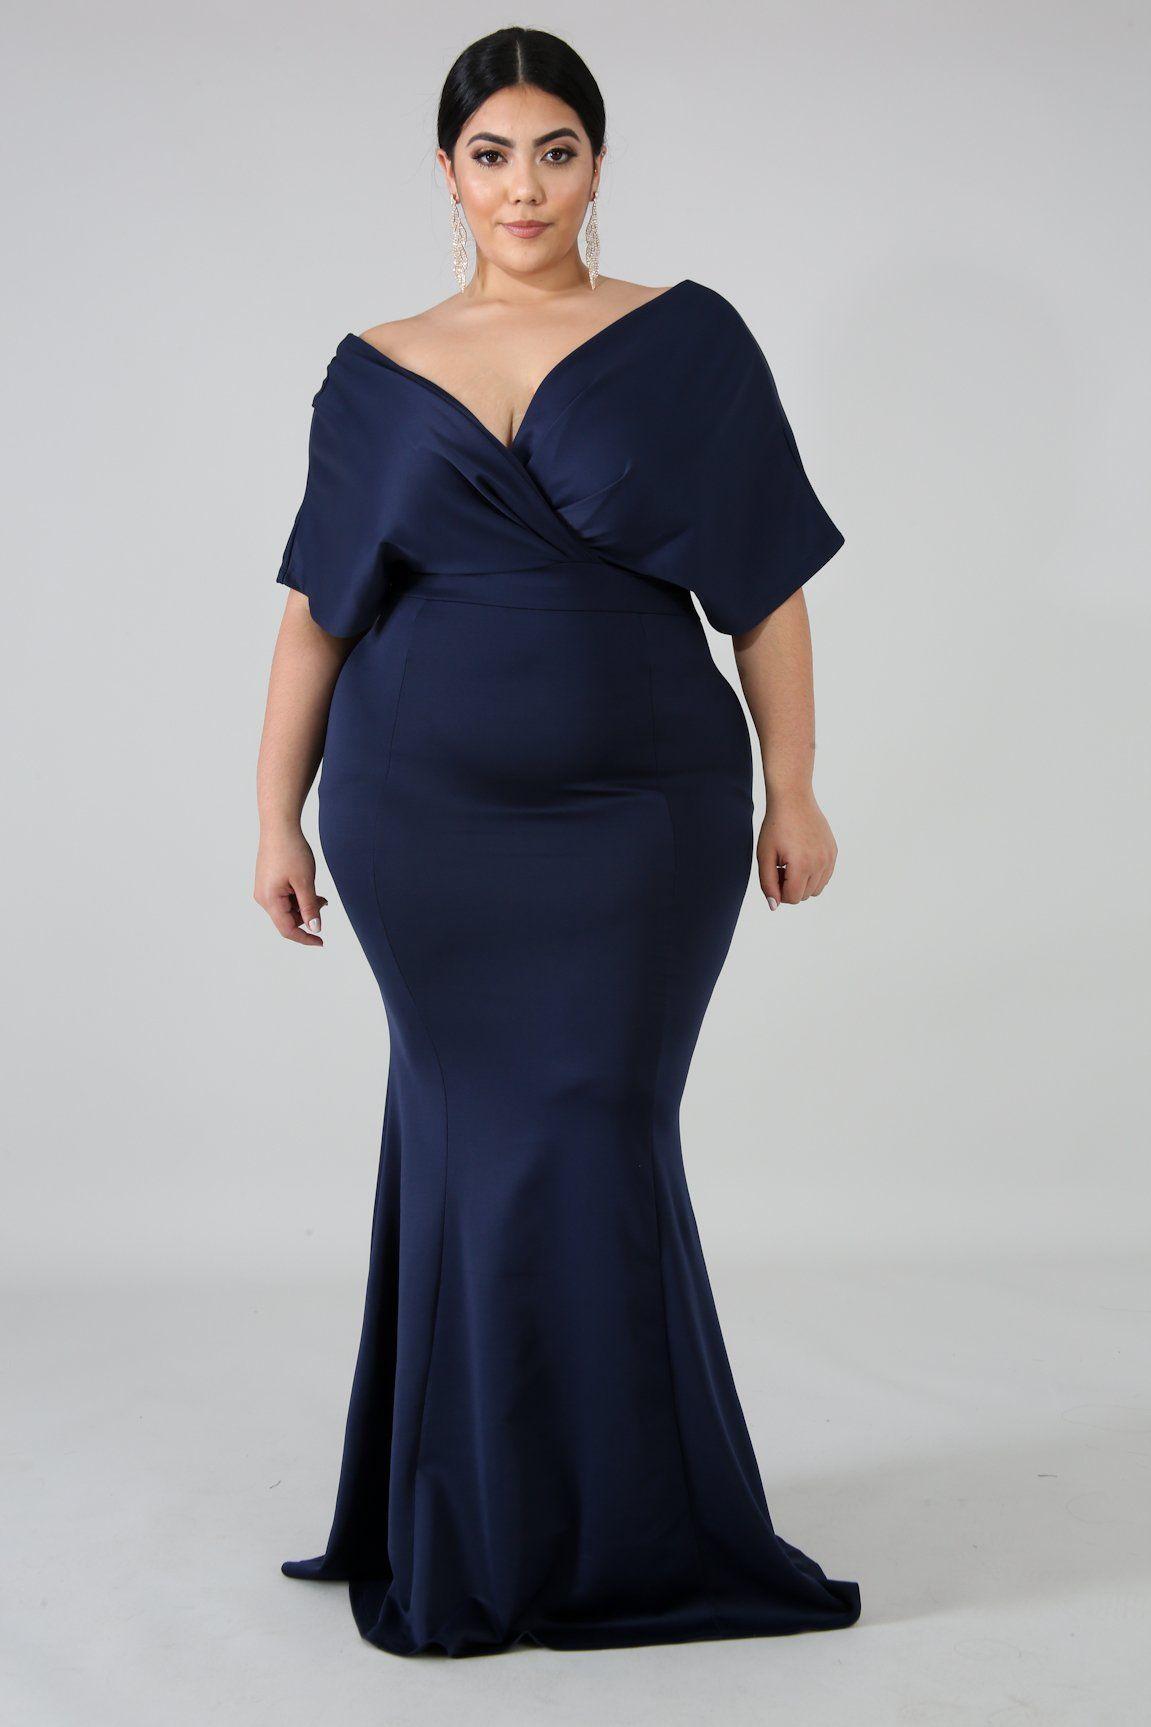 Style Gt1318p Description This Elegance Glam Maxi Dress Features A Stretchy Fabric Off Shoulder V Nec Glam Maxi Dress Maxi Dress Bridesmaid Dresses Plus Size [ 1727 x 1151 Pixel ]